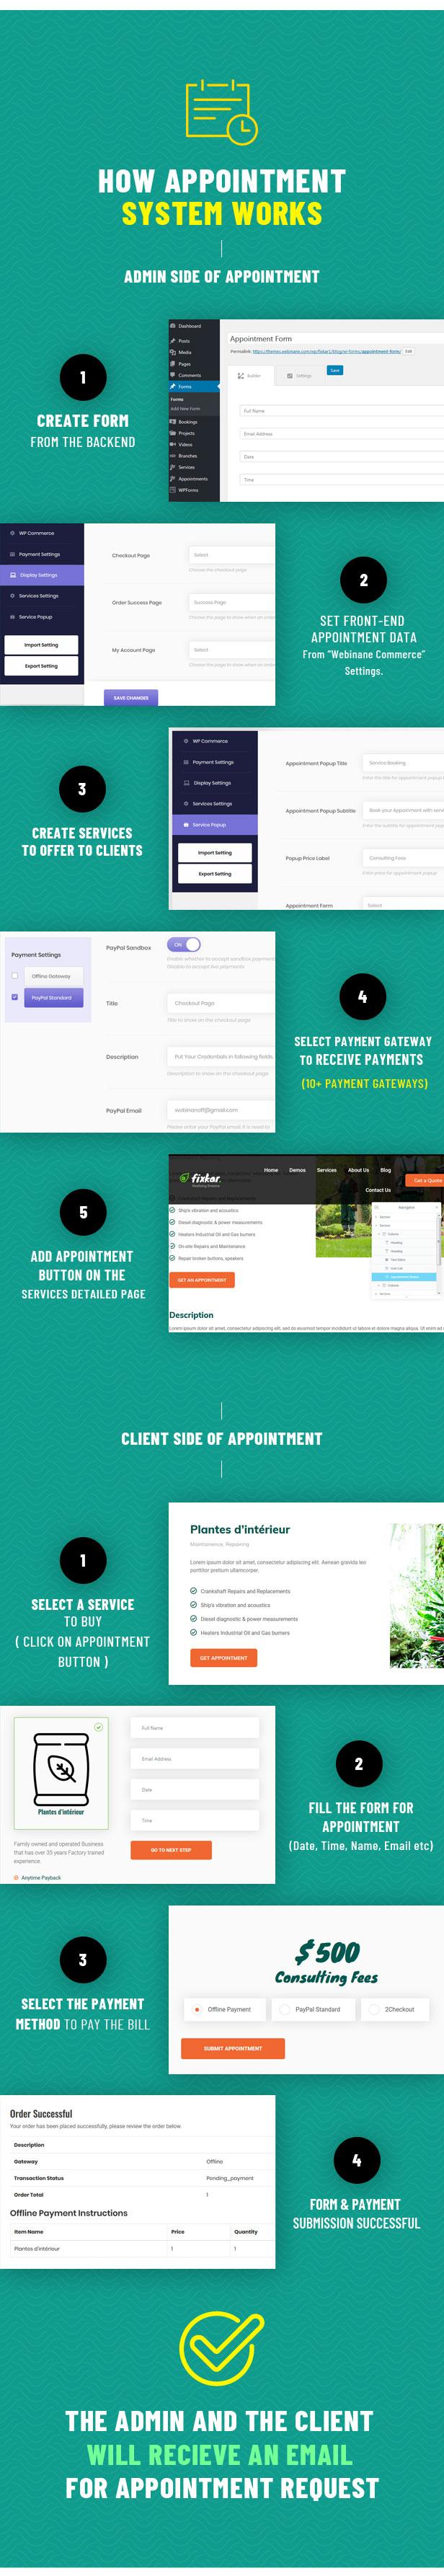 FixKar - All Services WordPress Theme - 7